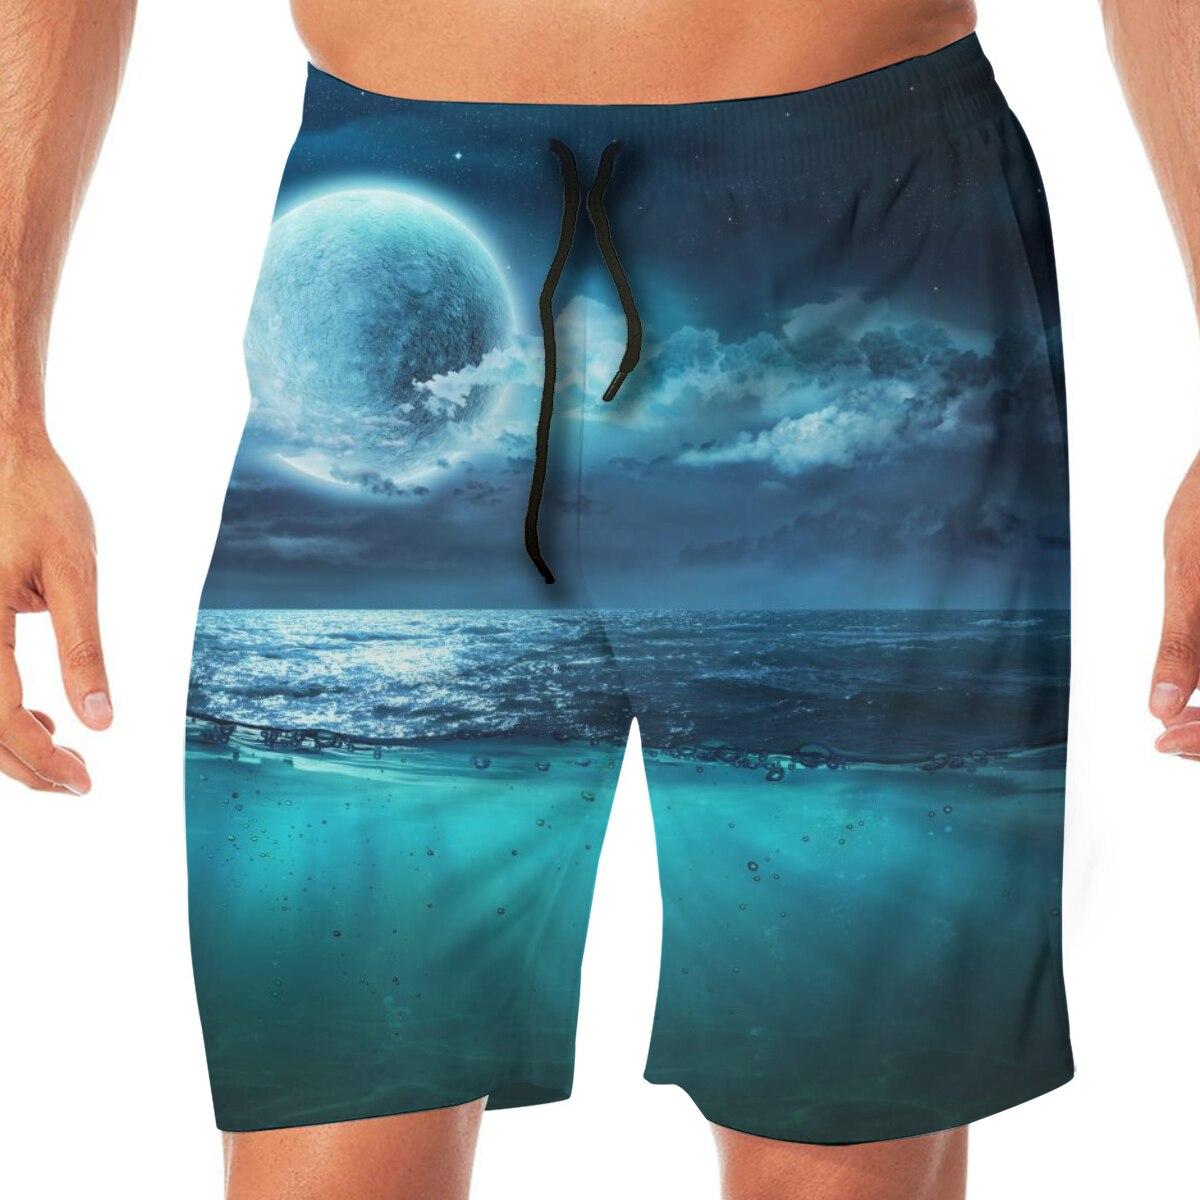 Full Moon On Sea Night Scene Mens Swimsuit Swimwear Men Swimming Shorts Beach Short Sports Suits Surf Board Swim Trunks